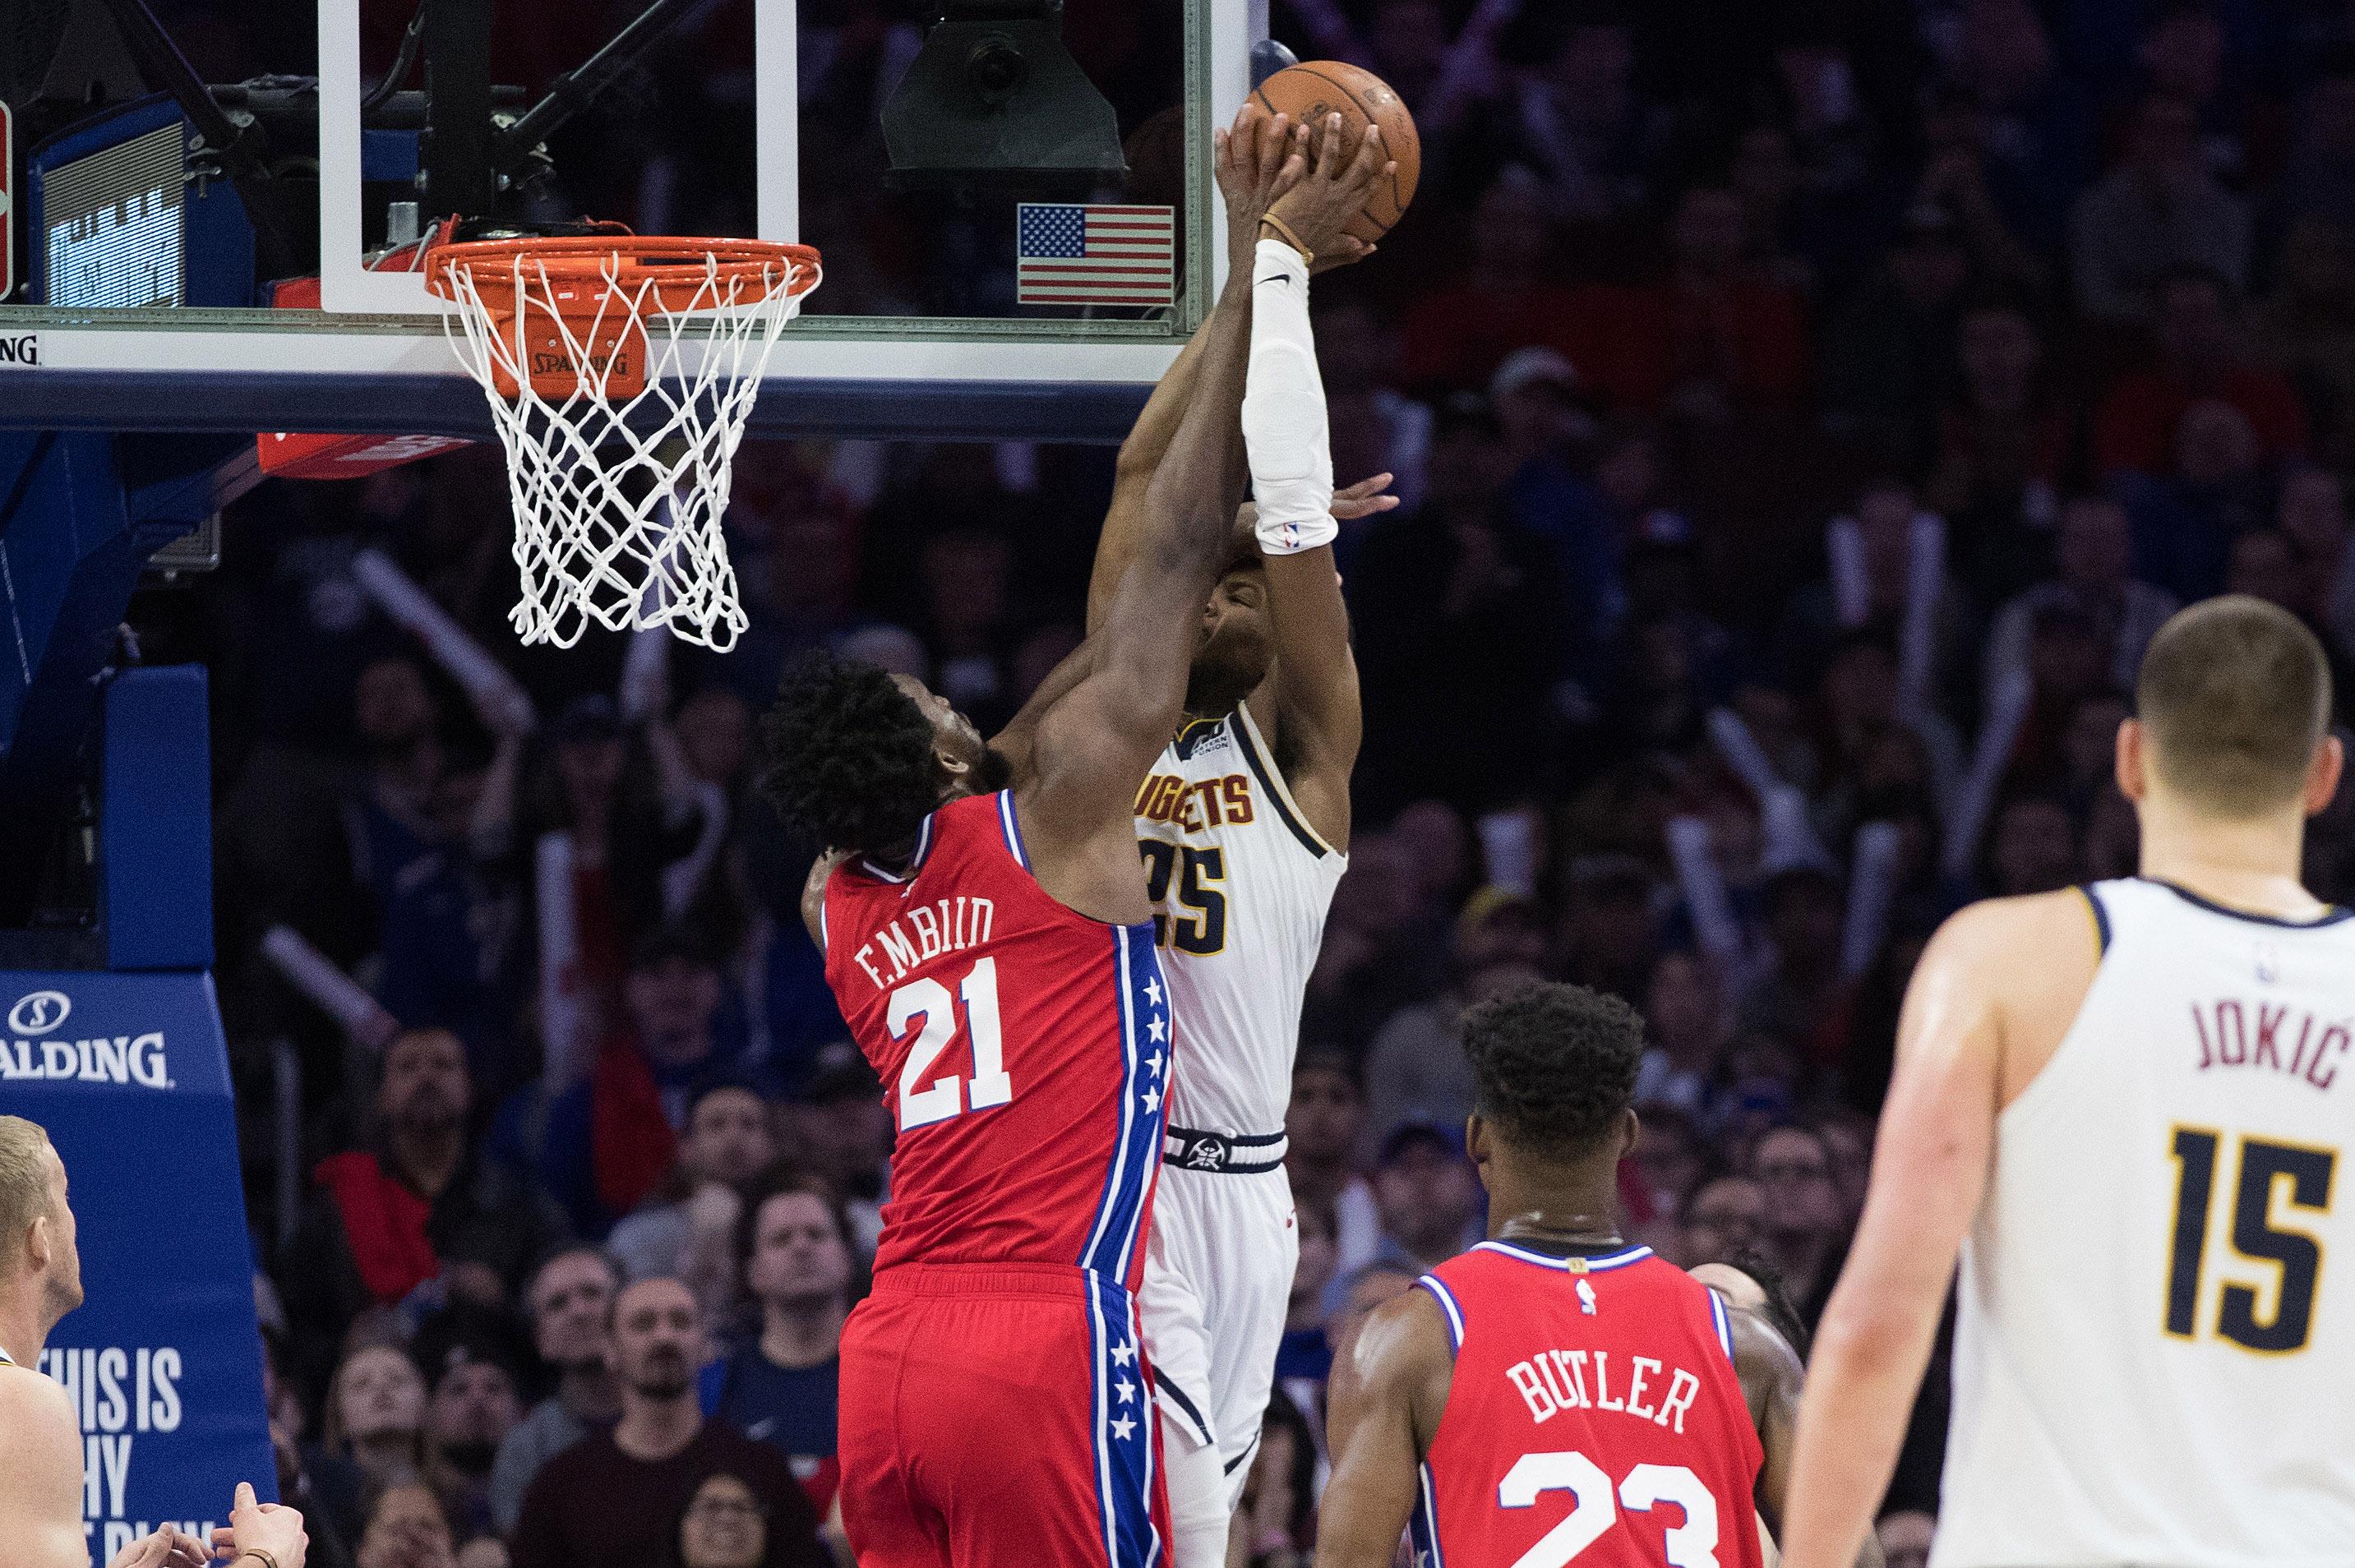 Philadelphia, PA, USA; Philadelphia 76ers center Joel Embiid (21) blocks the shot of Denver Nuggets guard Malik Beasley (25) during the fourth quarter at Wells Fargo Center.